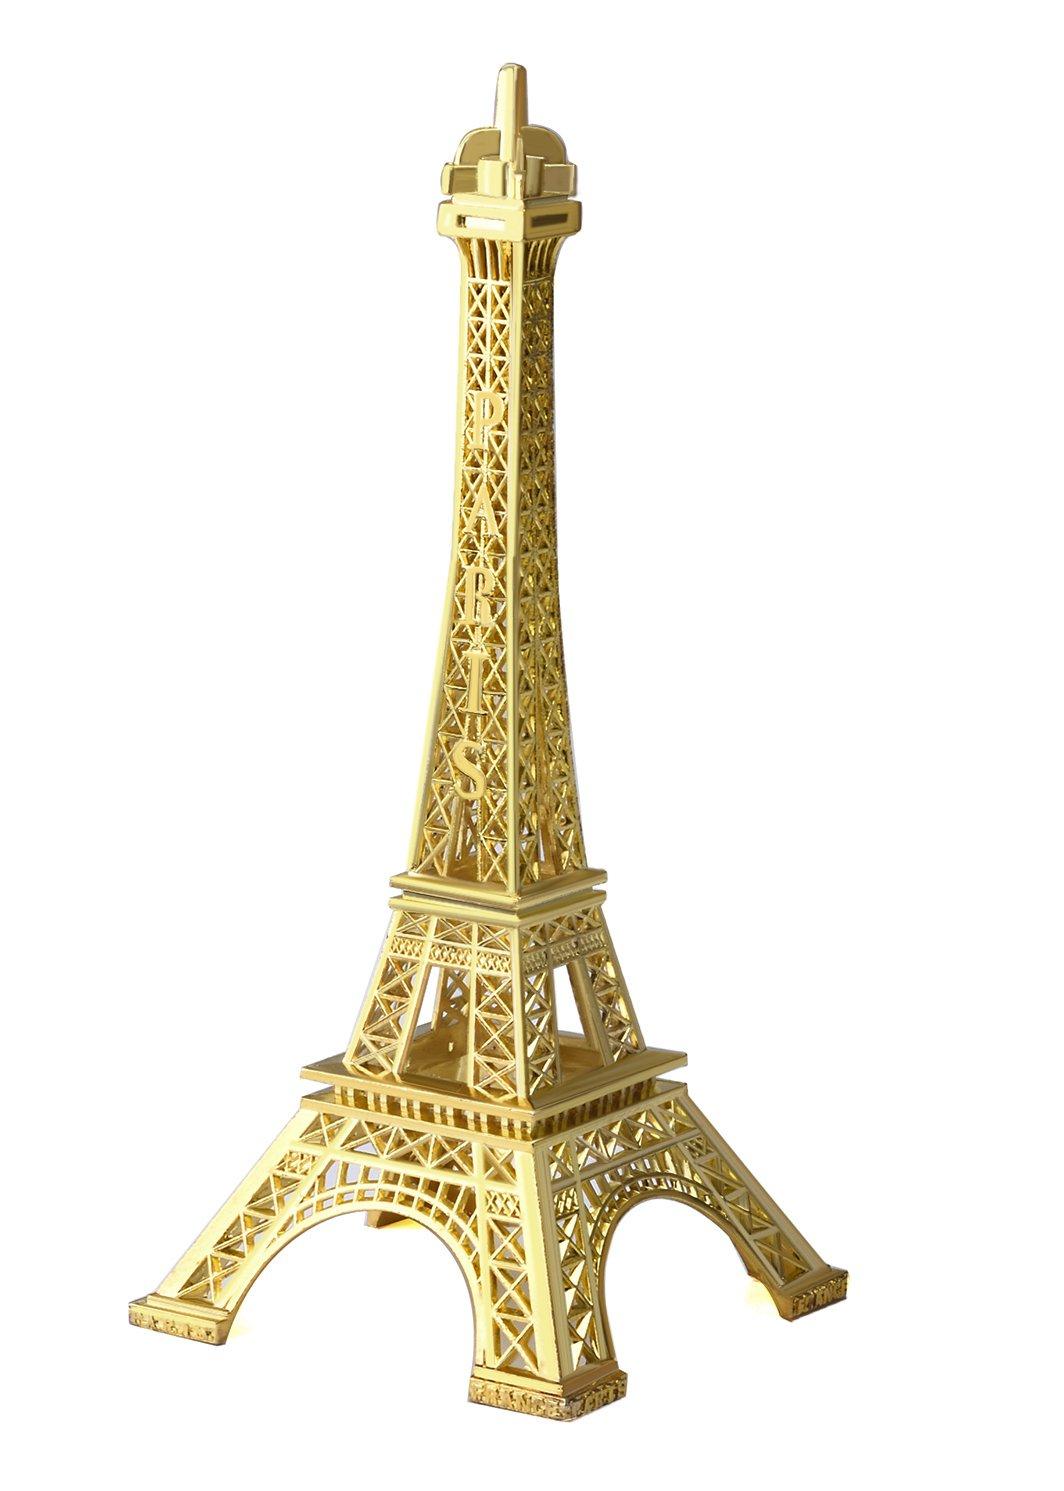 Cheap Eiffel Tower Room Decor, find Eiffel Tower Room Decor deals on ...